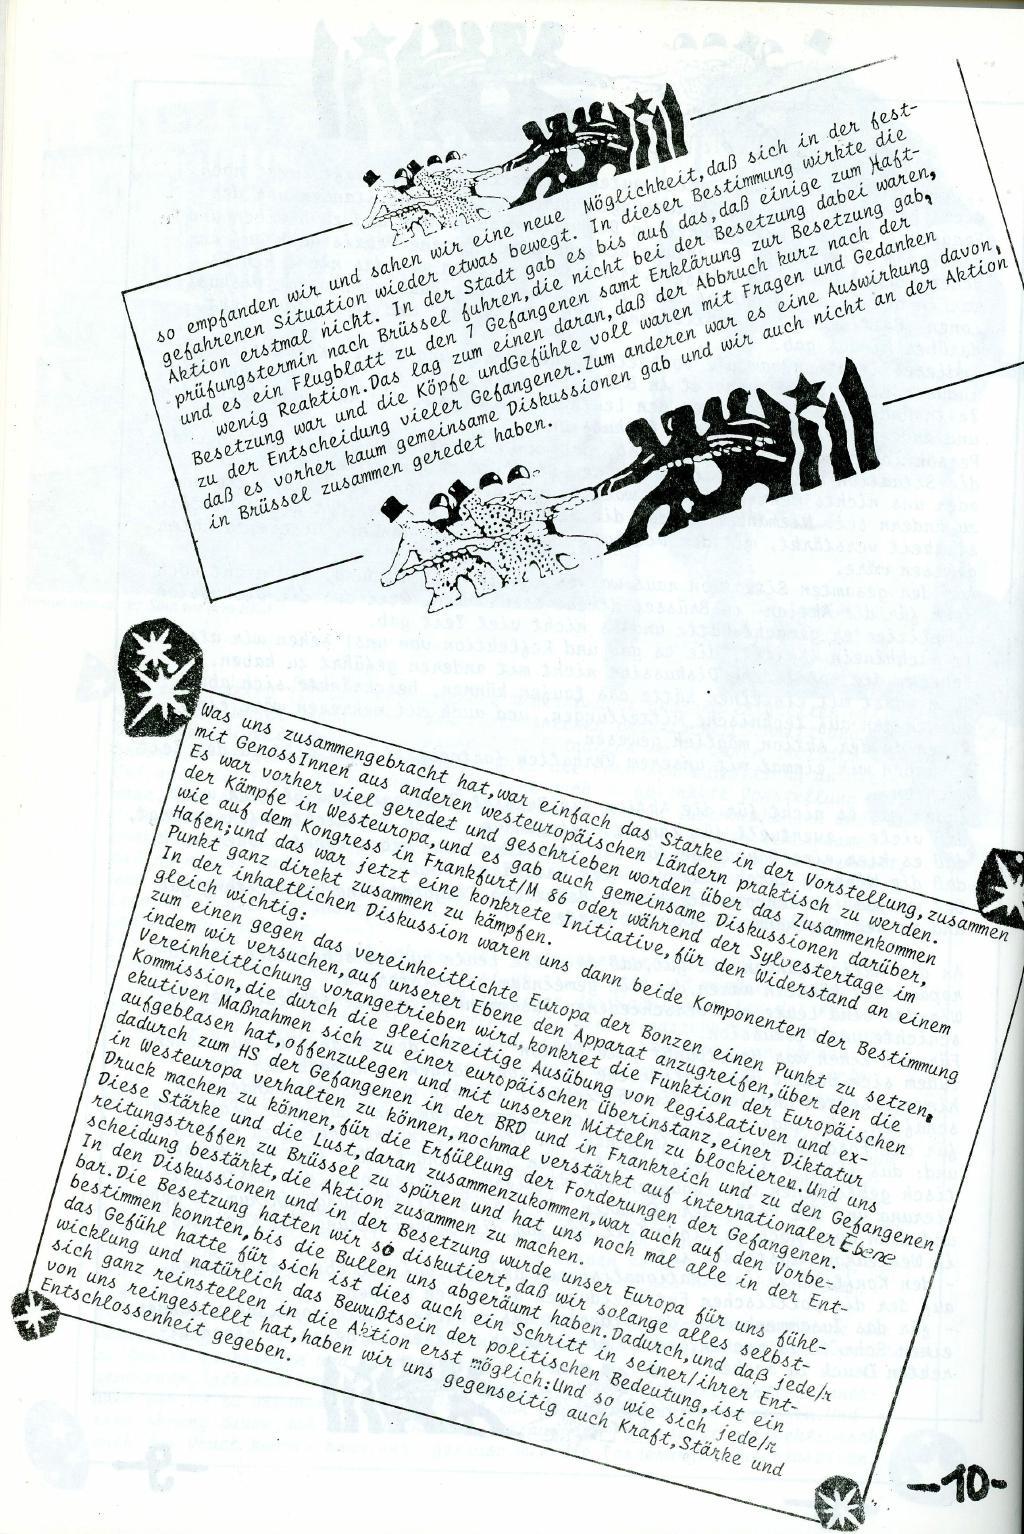 Belgien_Doku_Besetzung_EG_Kommission_1989_012